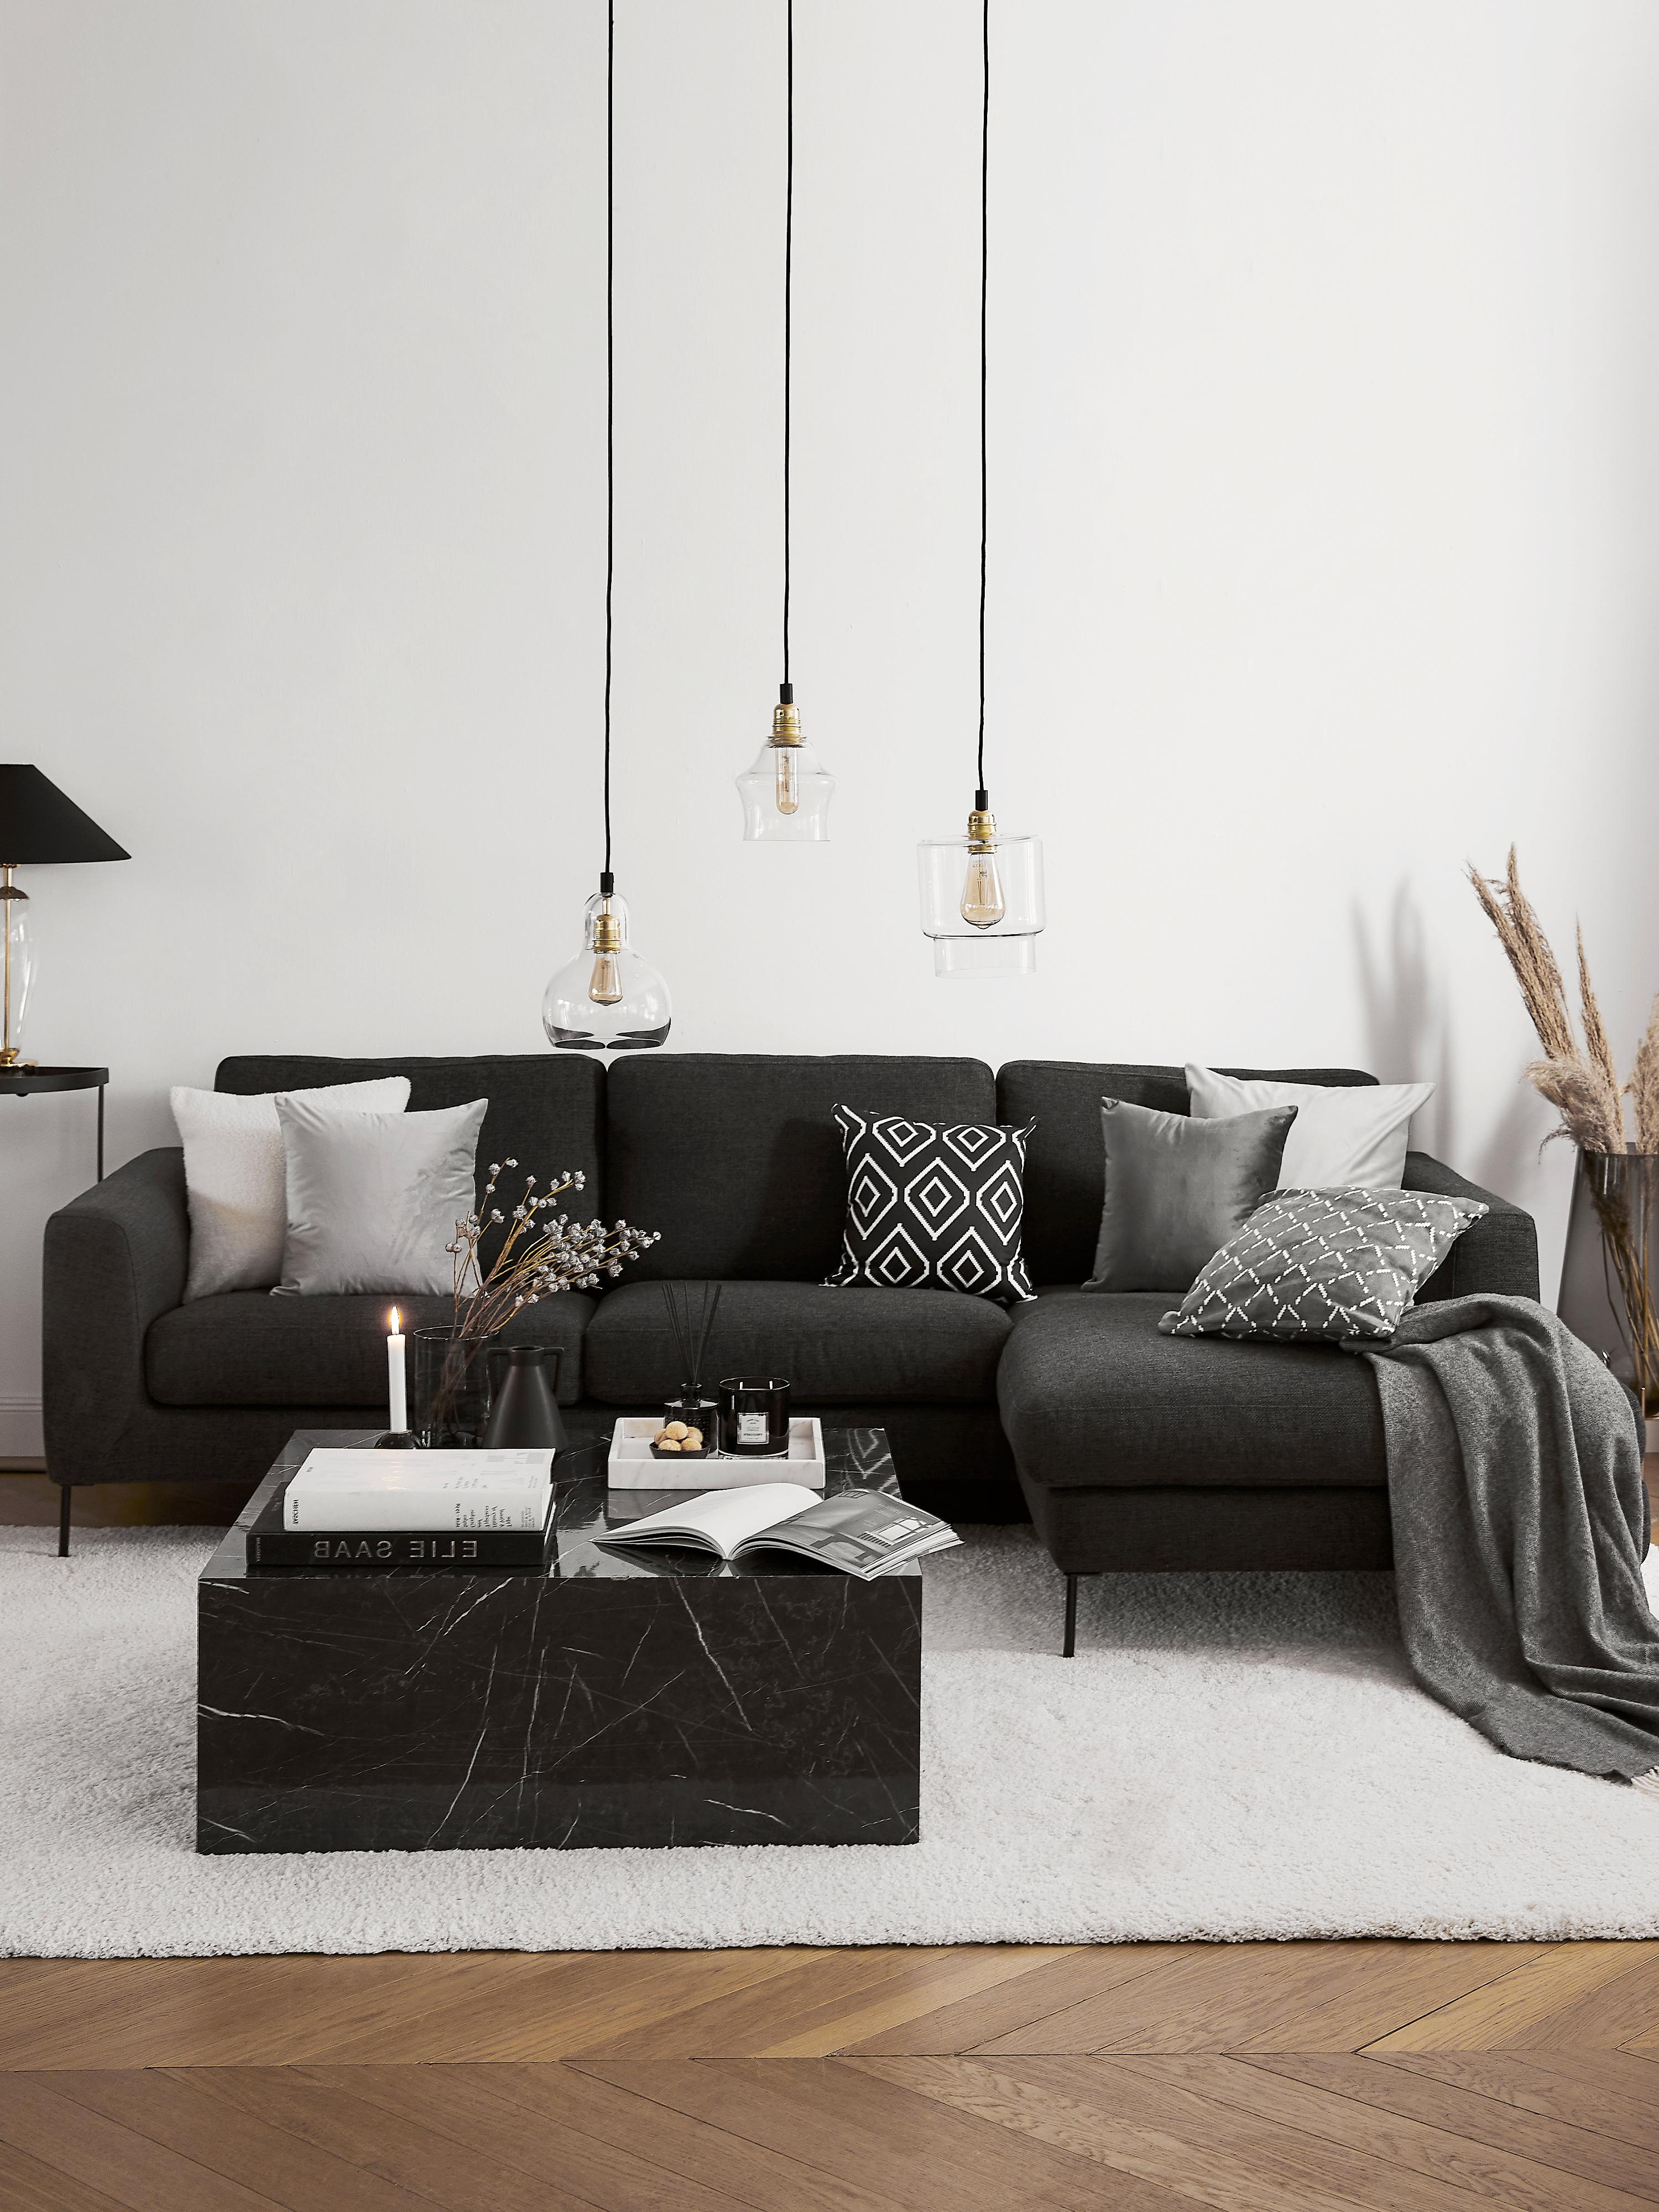 Ecksofa Cucita (4-Sitzer), Bezug: Webstoff (Polyester) Der , Gestell: Massives Kiefernholz, Füße: Metall, lackiert, Webstoff Anthrazit, B 302 x T 163 cm